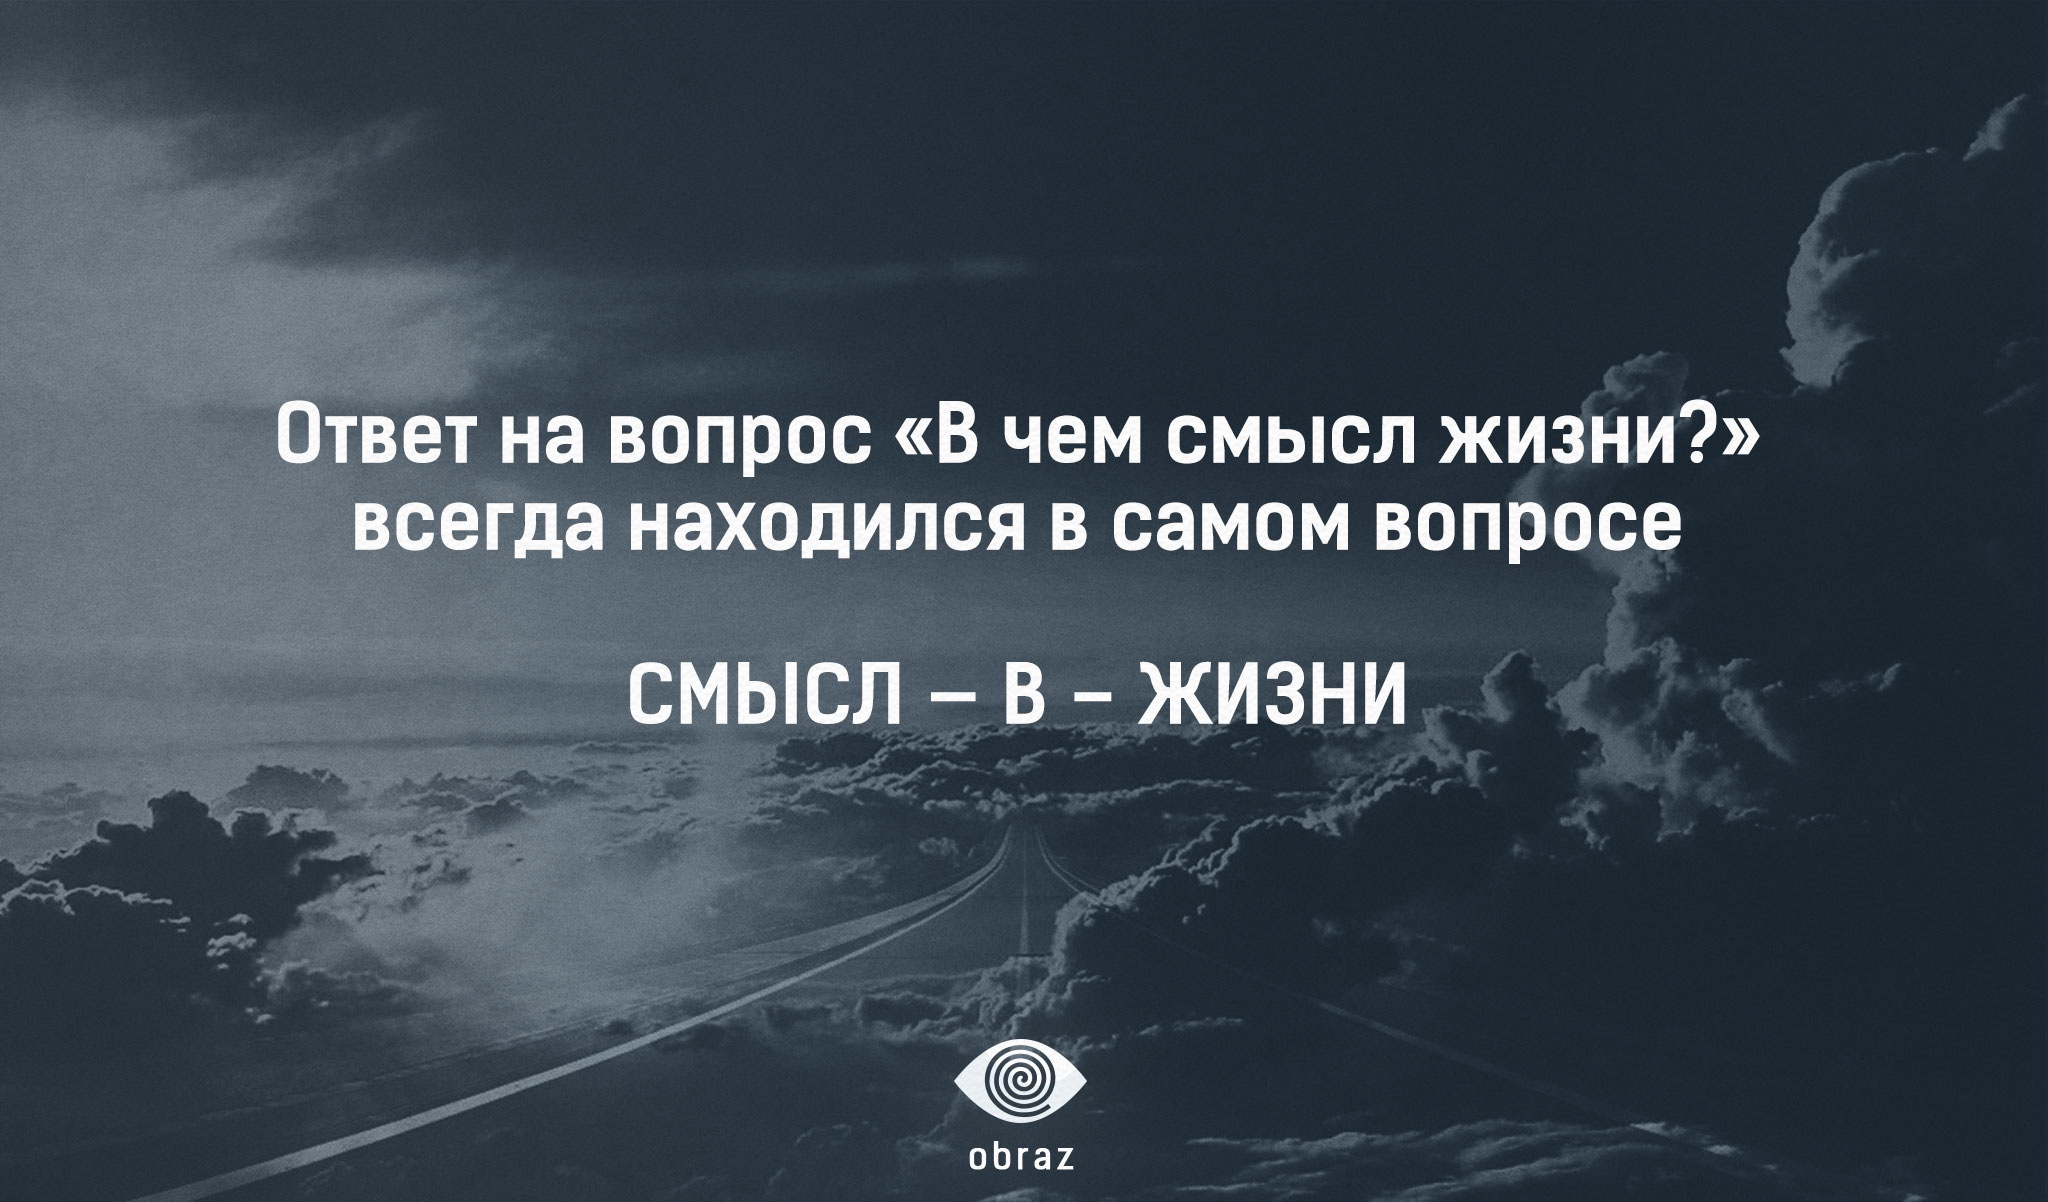 Email:learningkurakov@gmail com3292 kscutq.3zdye6d2t9